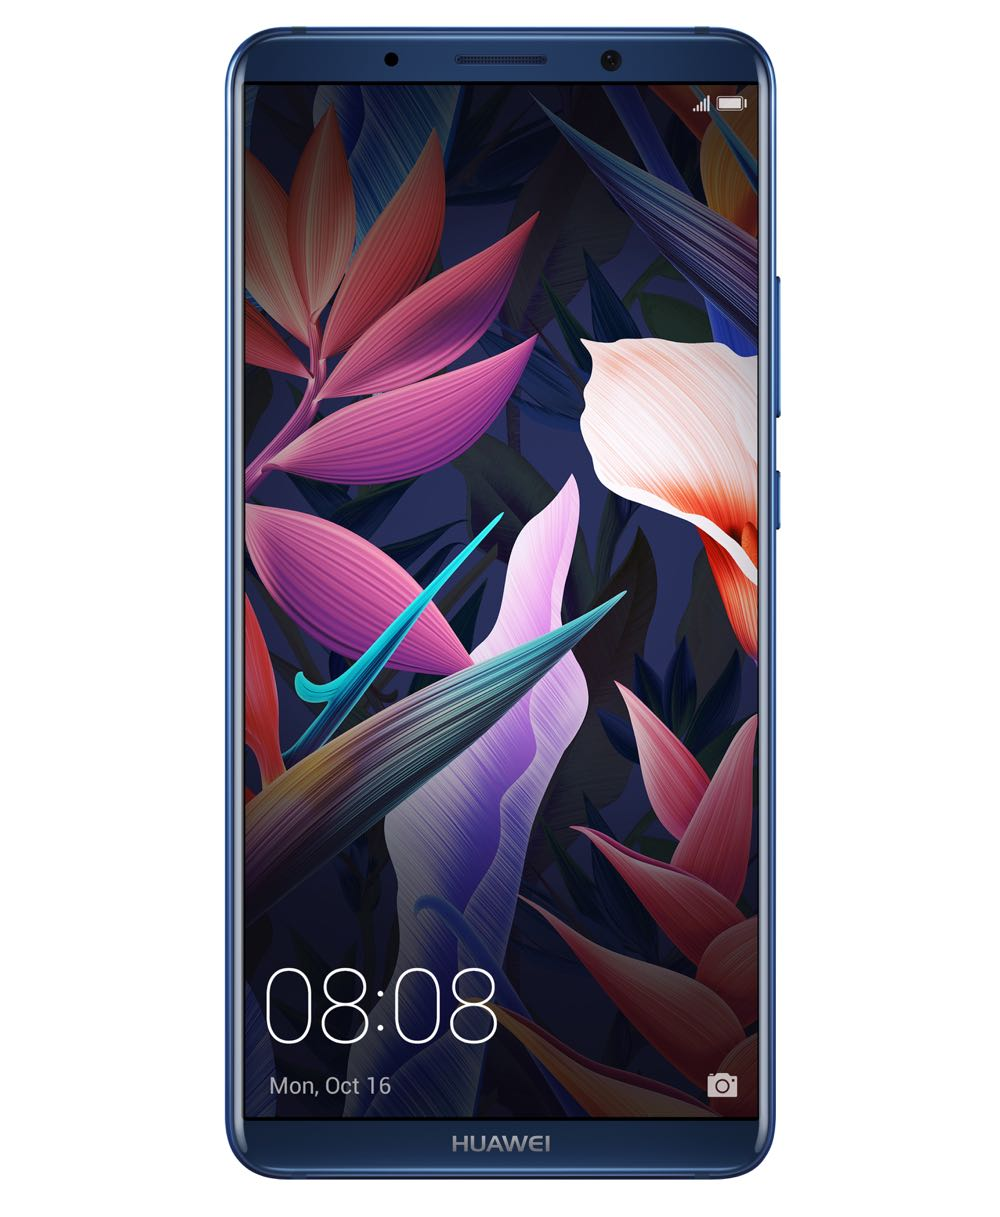 The Huawei Mate 10 Pro